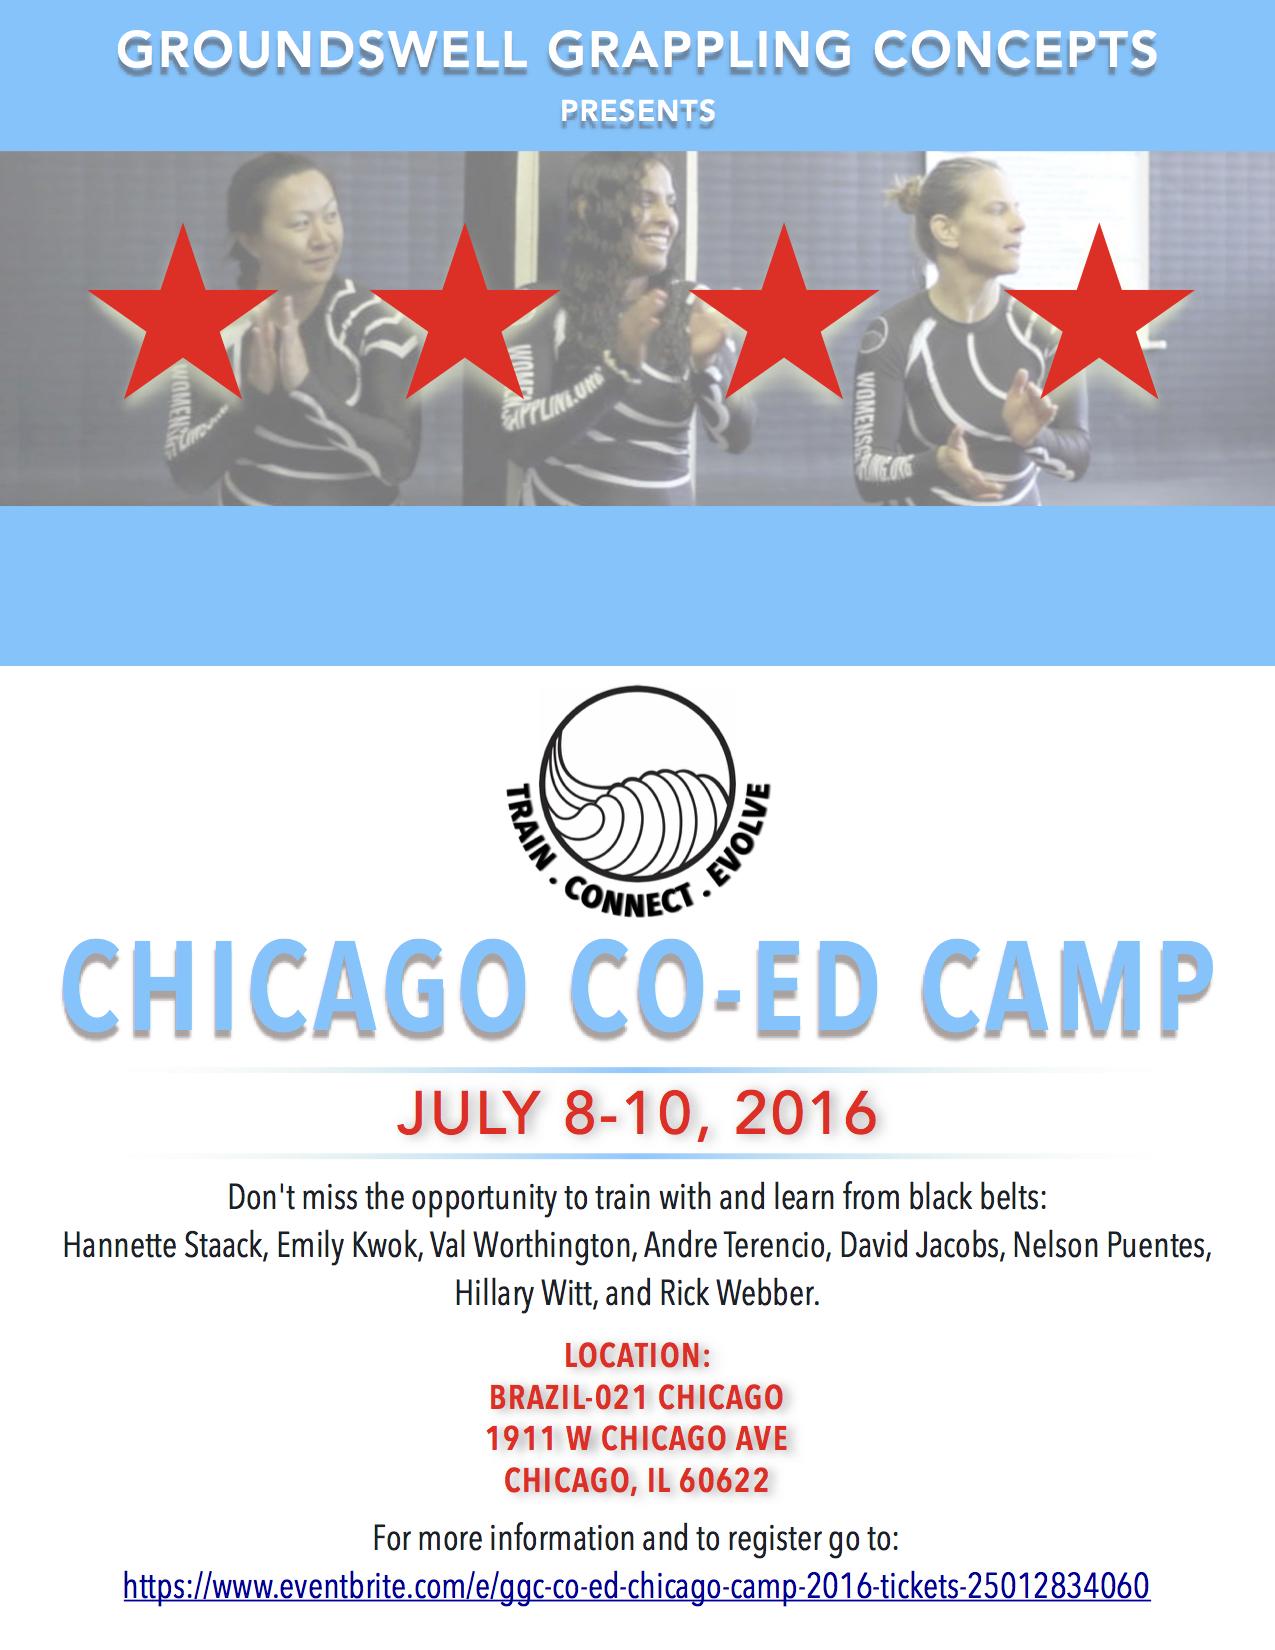 GGC Chicago Co-Ed Camp